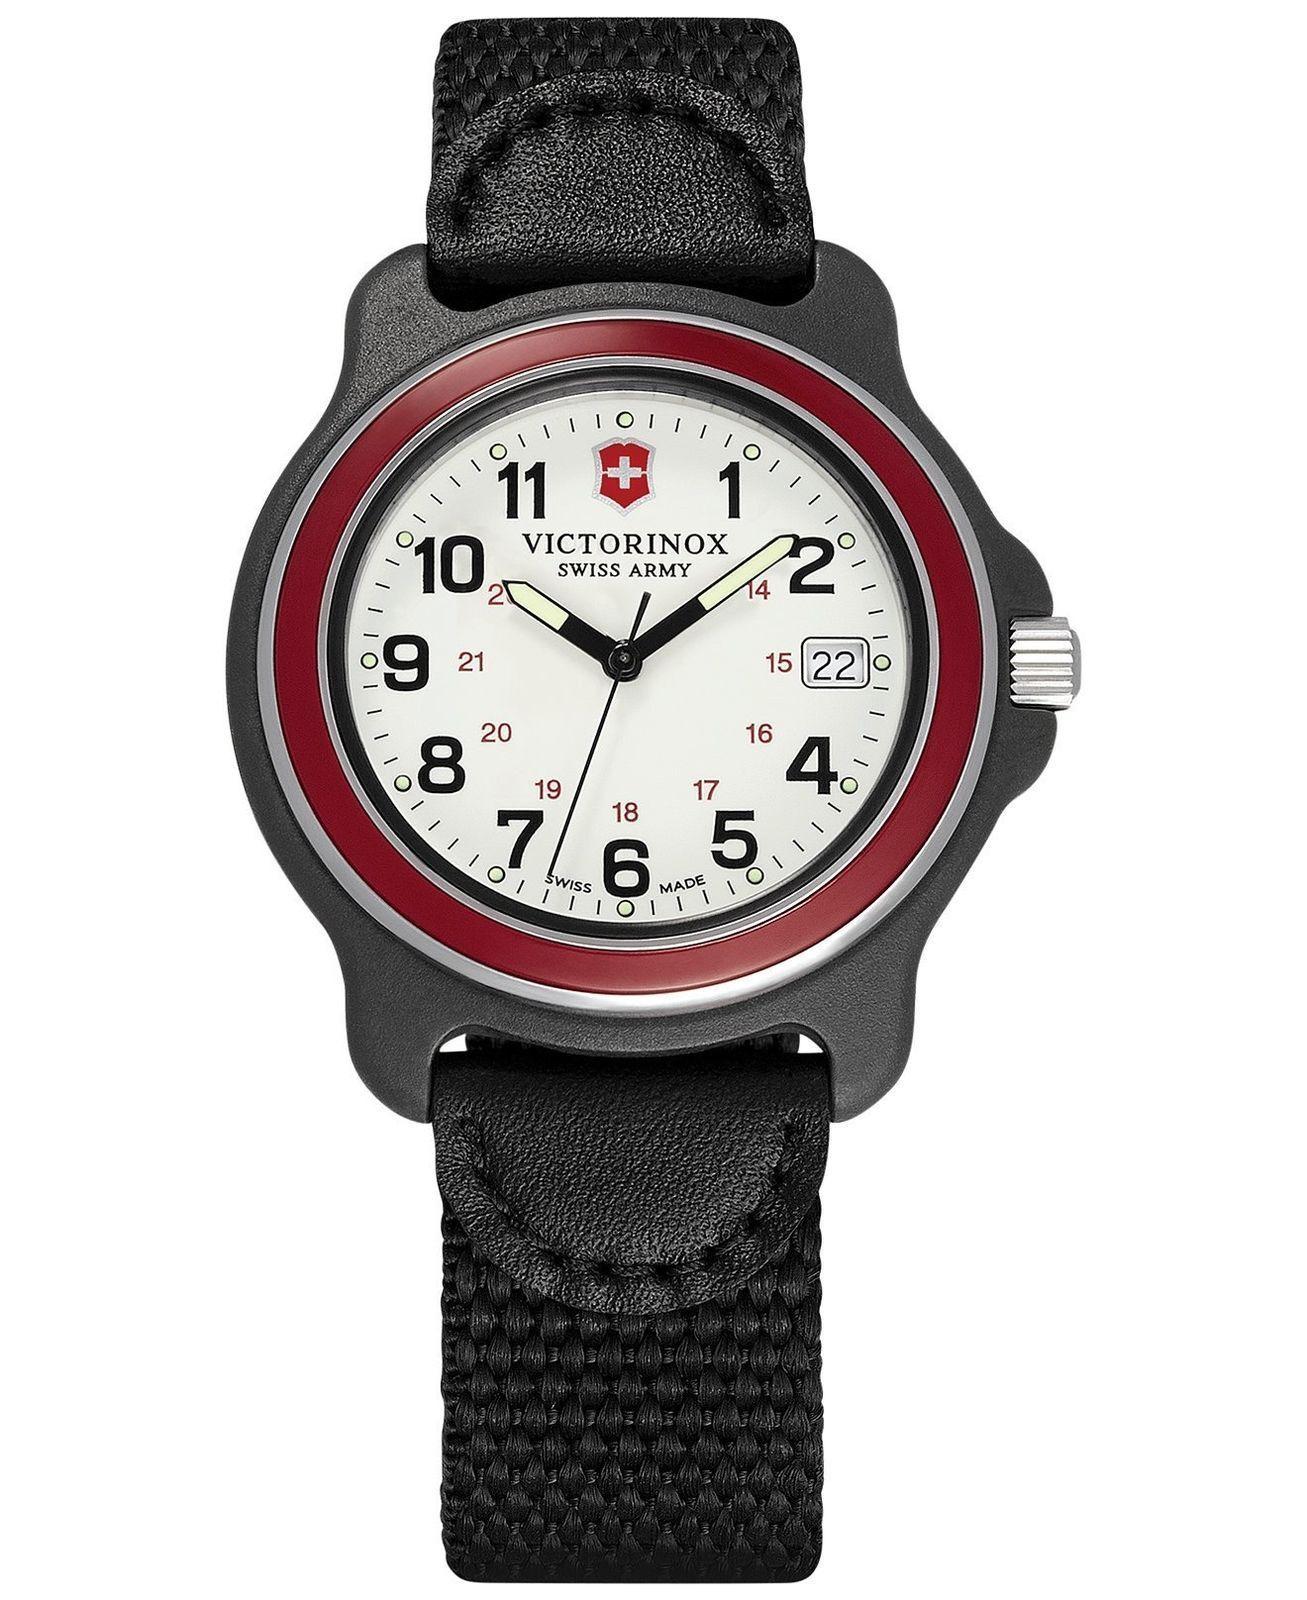 New victorinox swiss army watch original black msrp $ nylon strap men's.